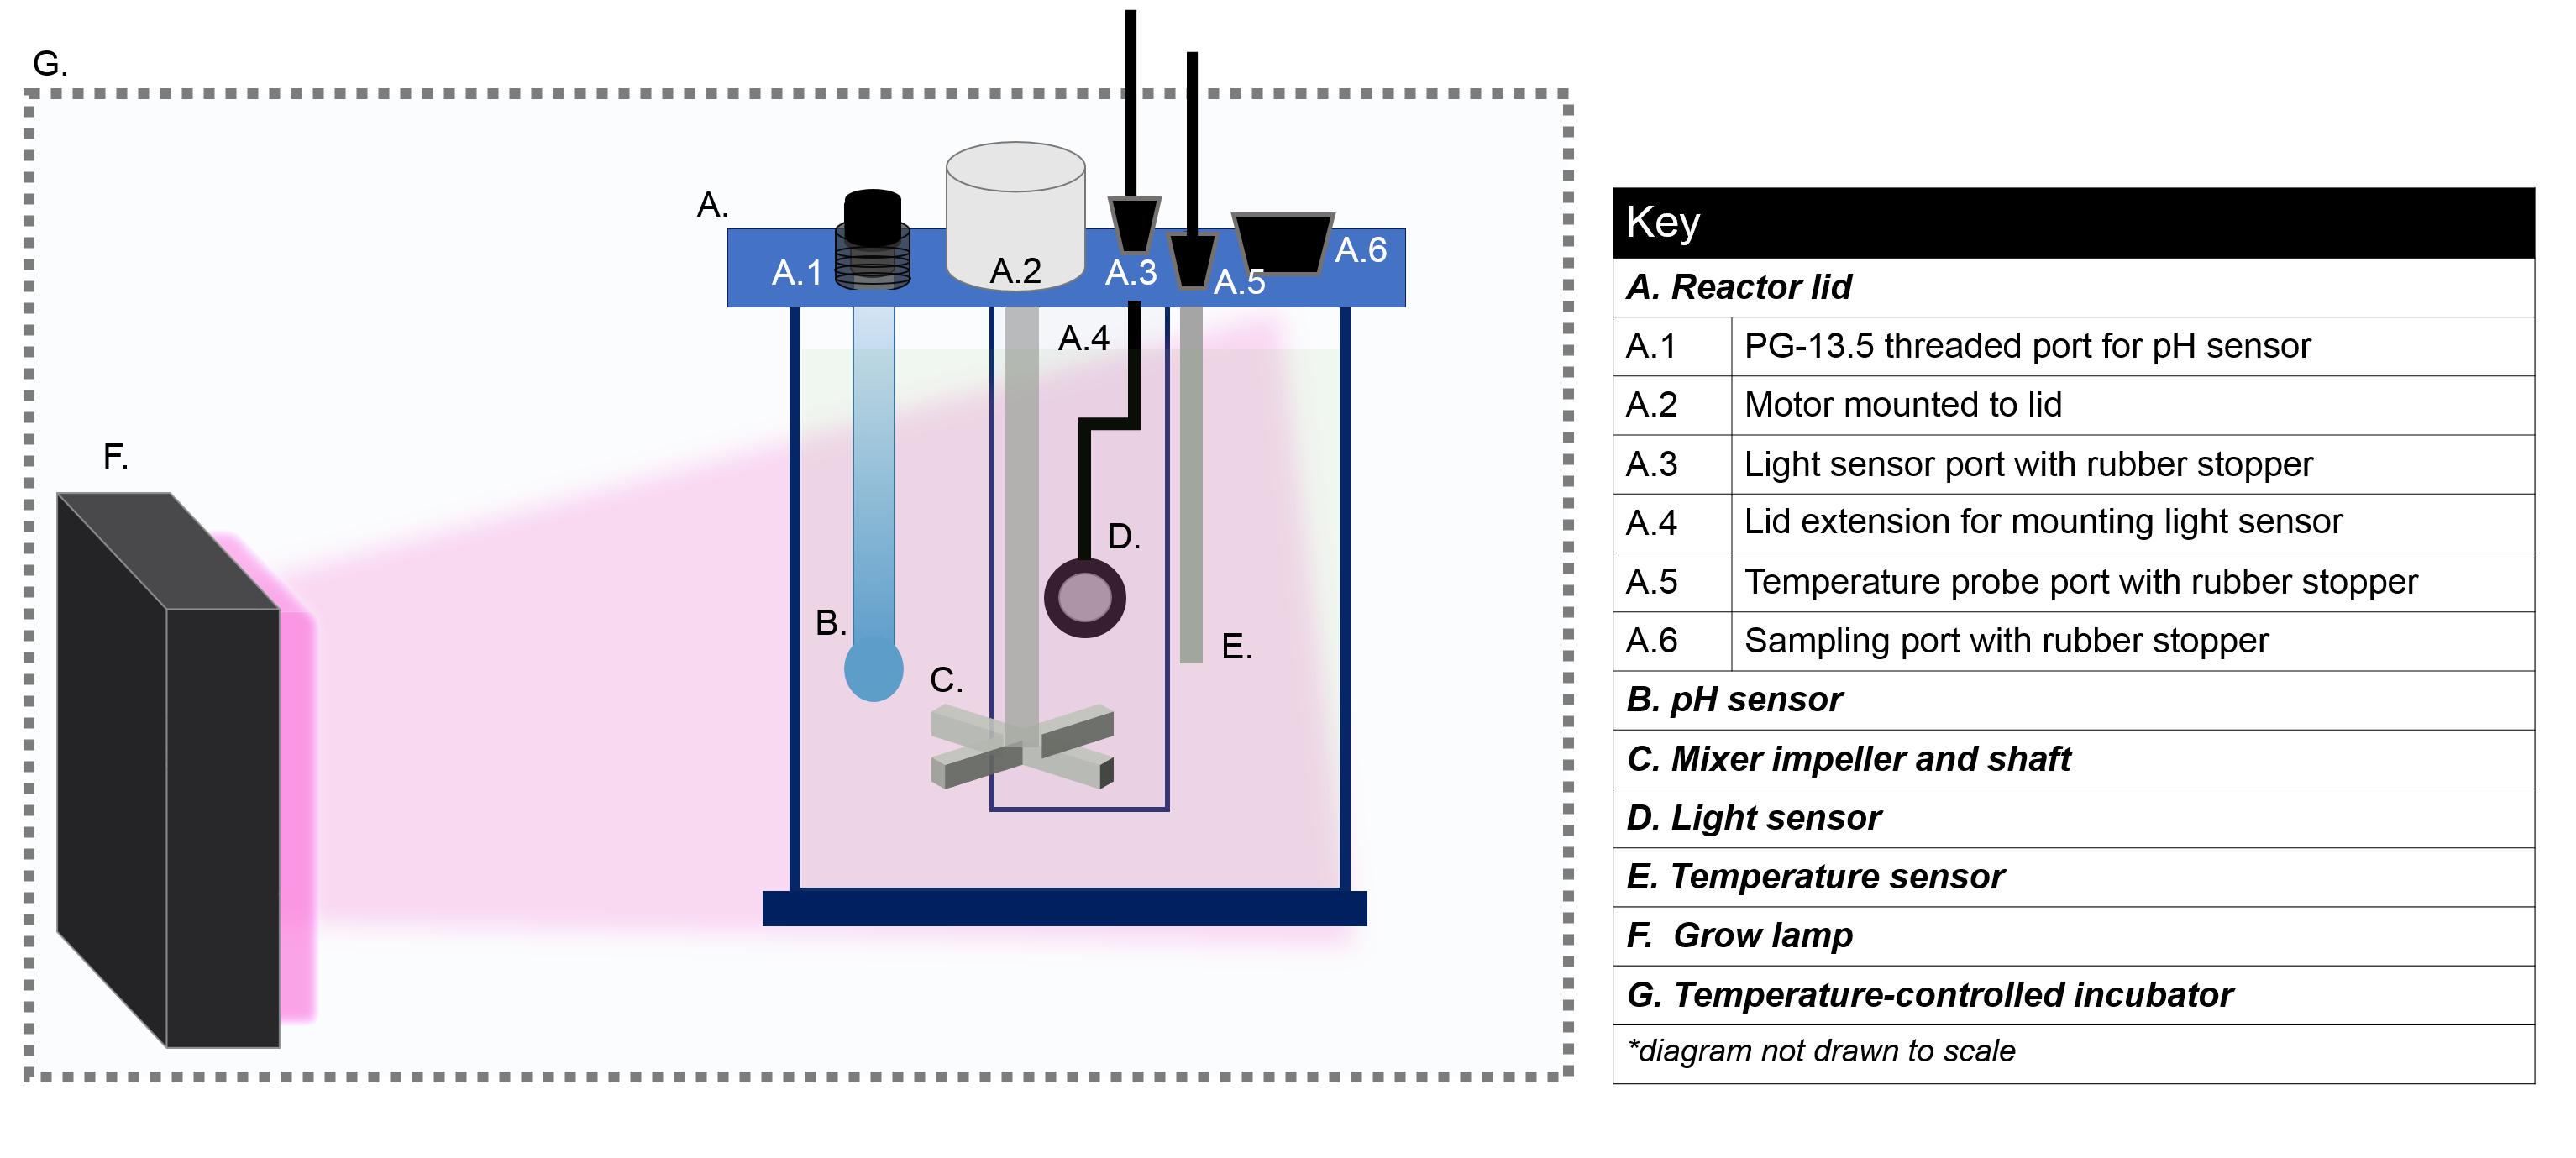 Ph Omega Wiring Diagram 15 - Wiring Diagrams List on